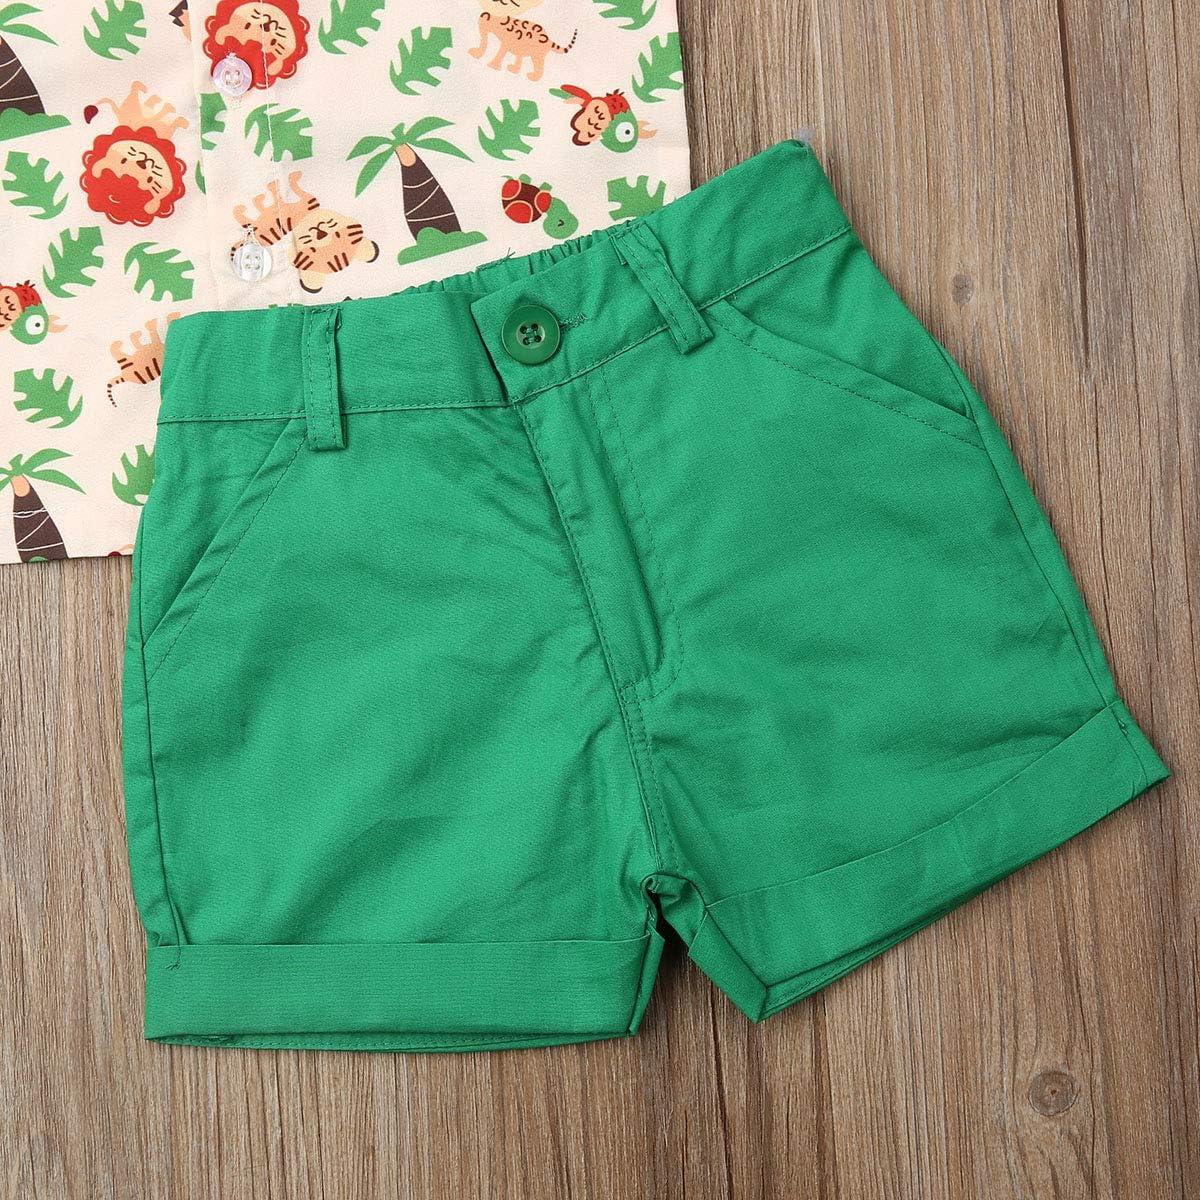 Shorts 2pcs Gentlemen Outfits Playwear Set Baby Boy Pineapple Bowtie Shirt Shirts